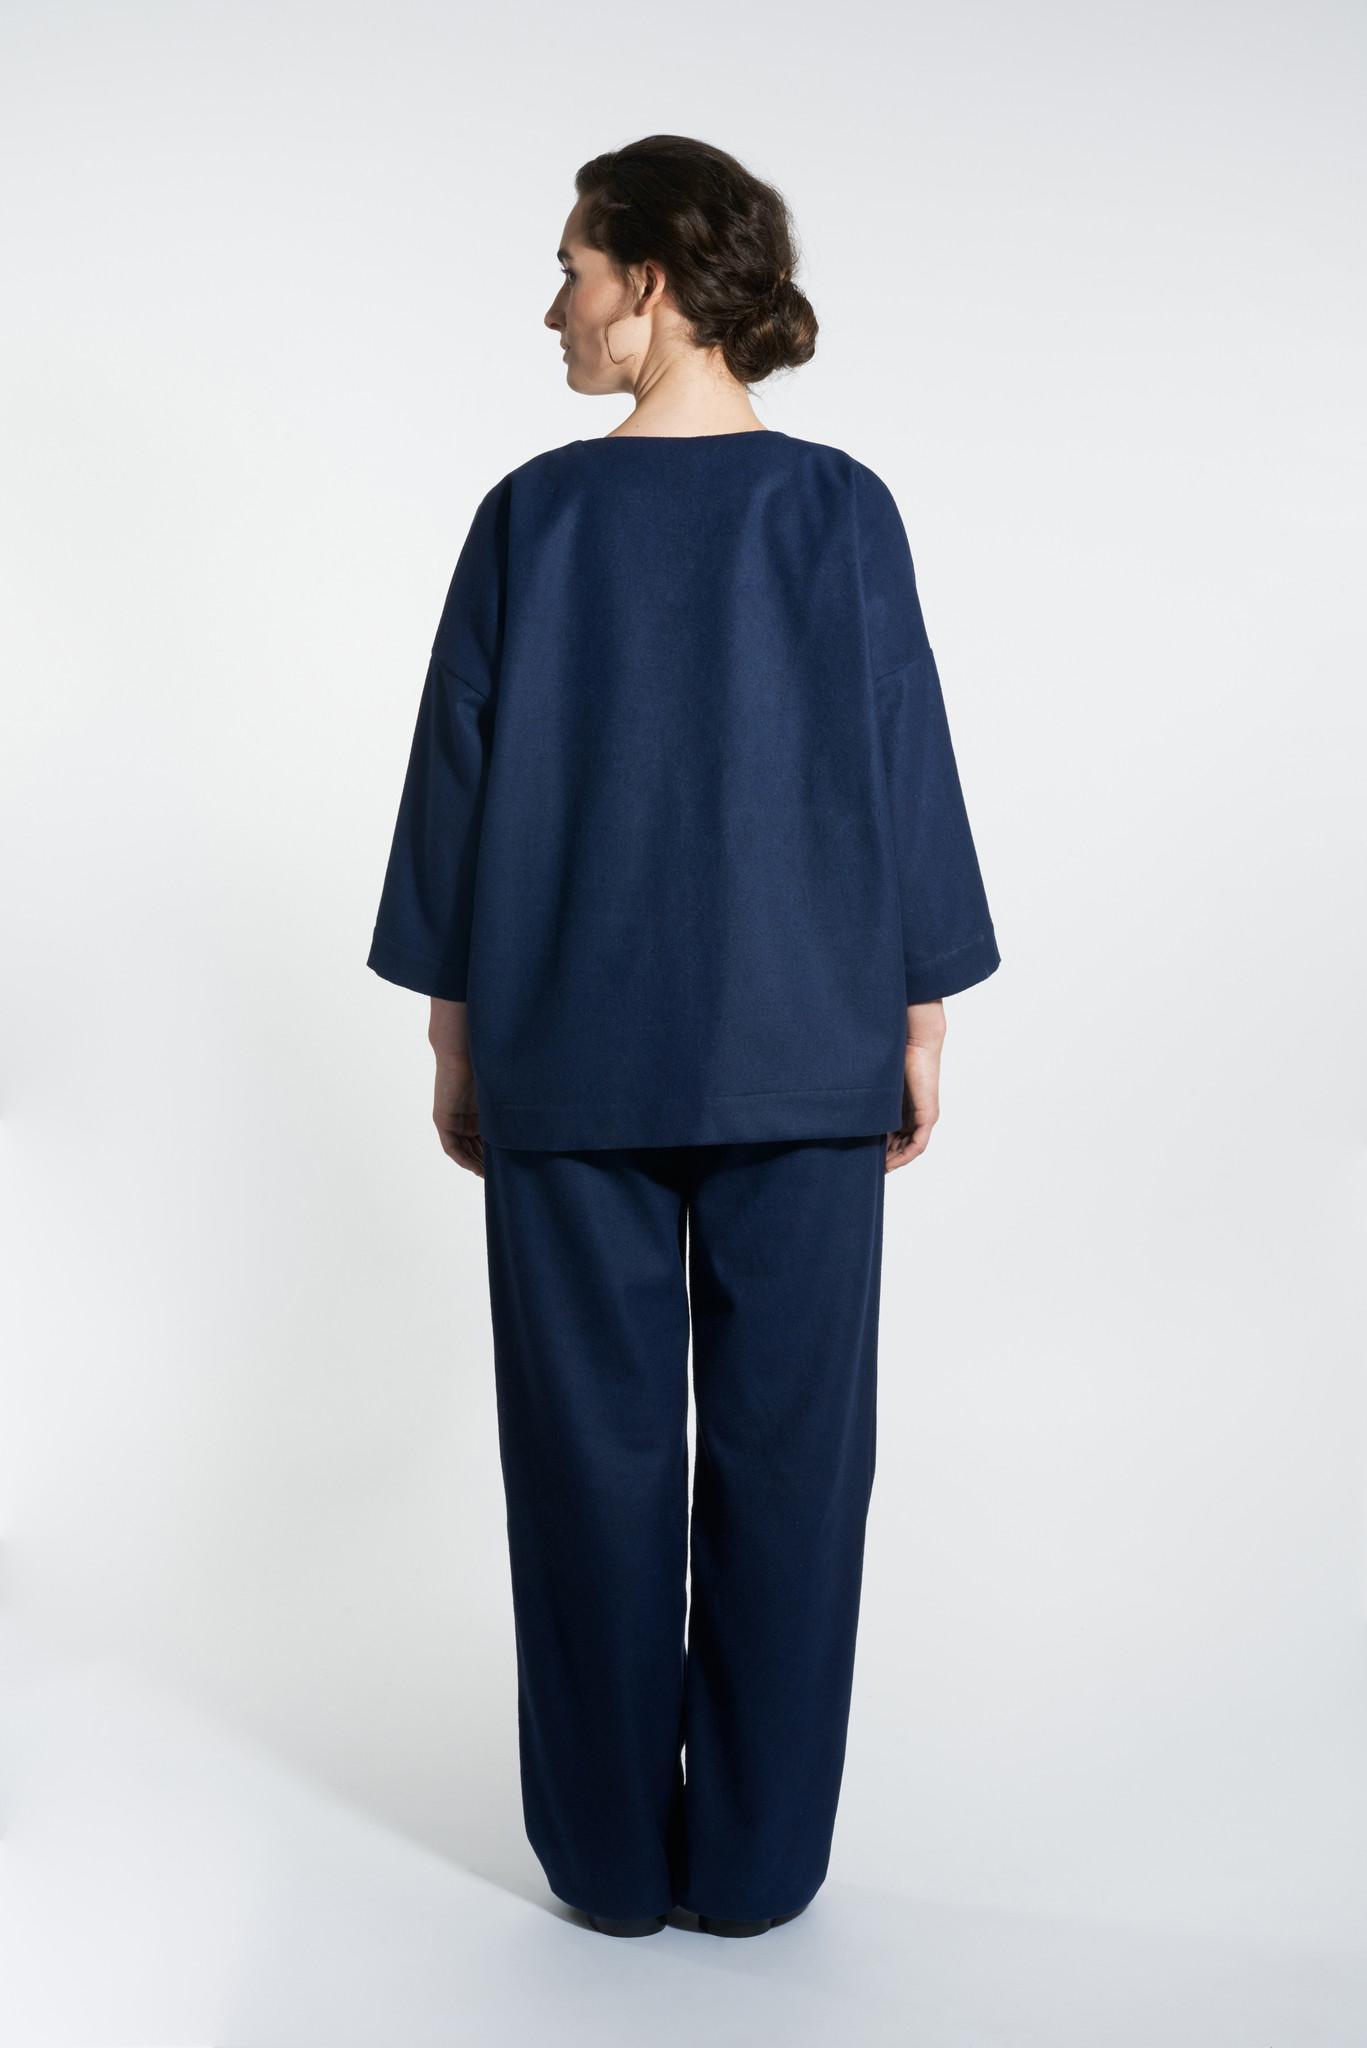 Kimono wool blend jacket - navy-3